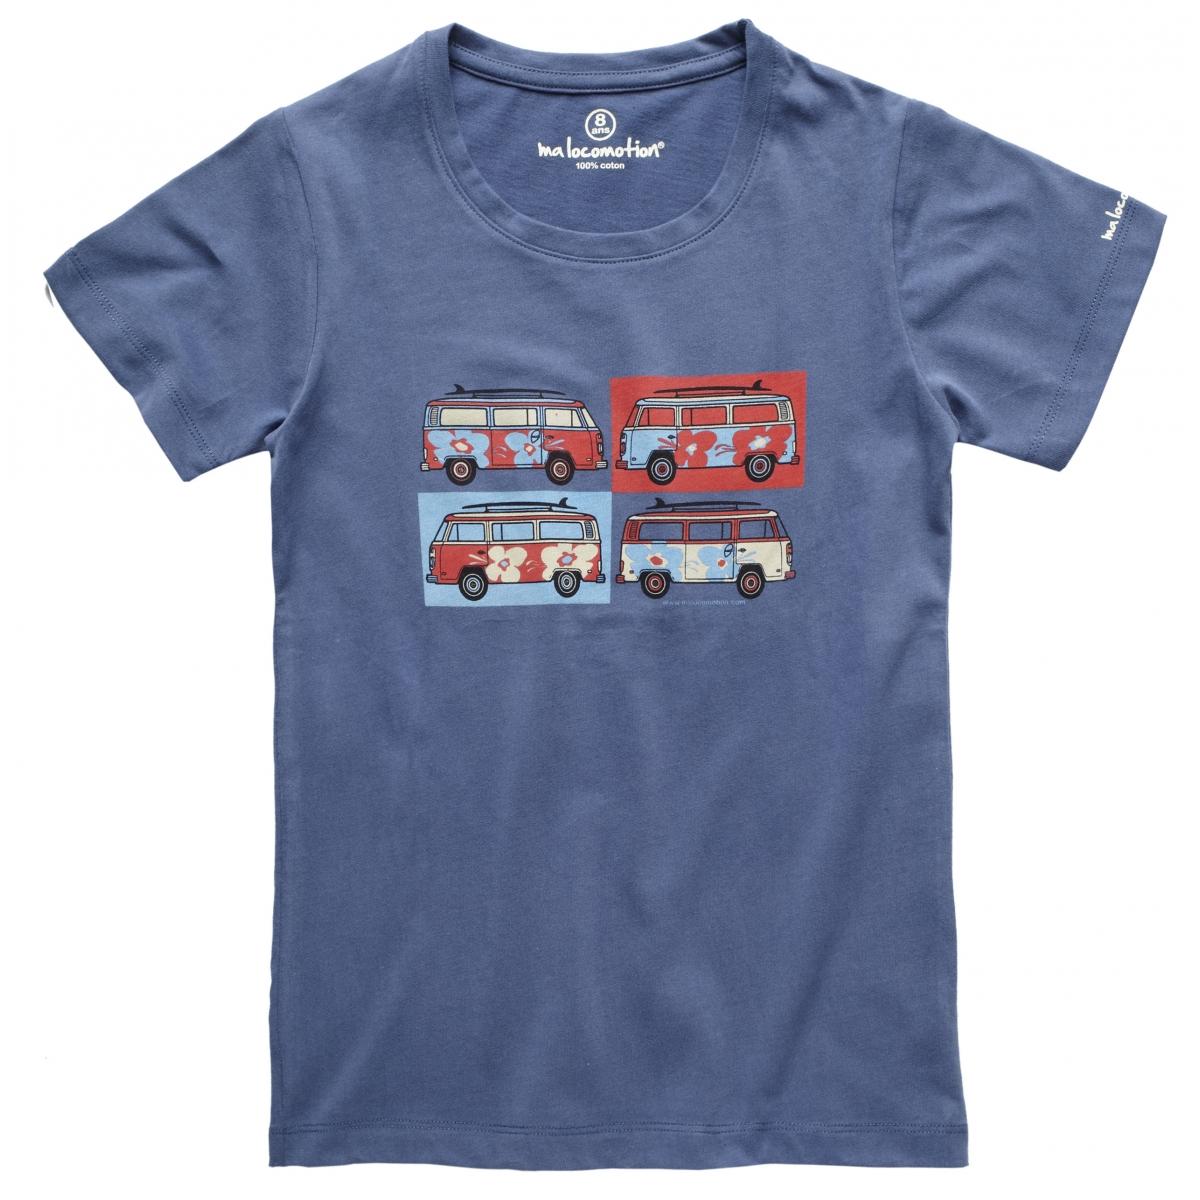 Camper van t-shirt for kids